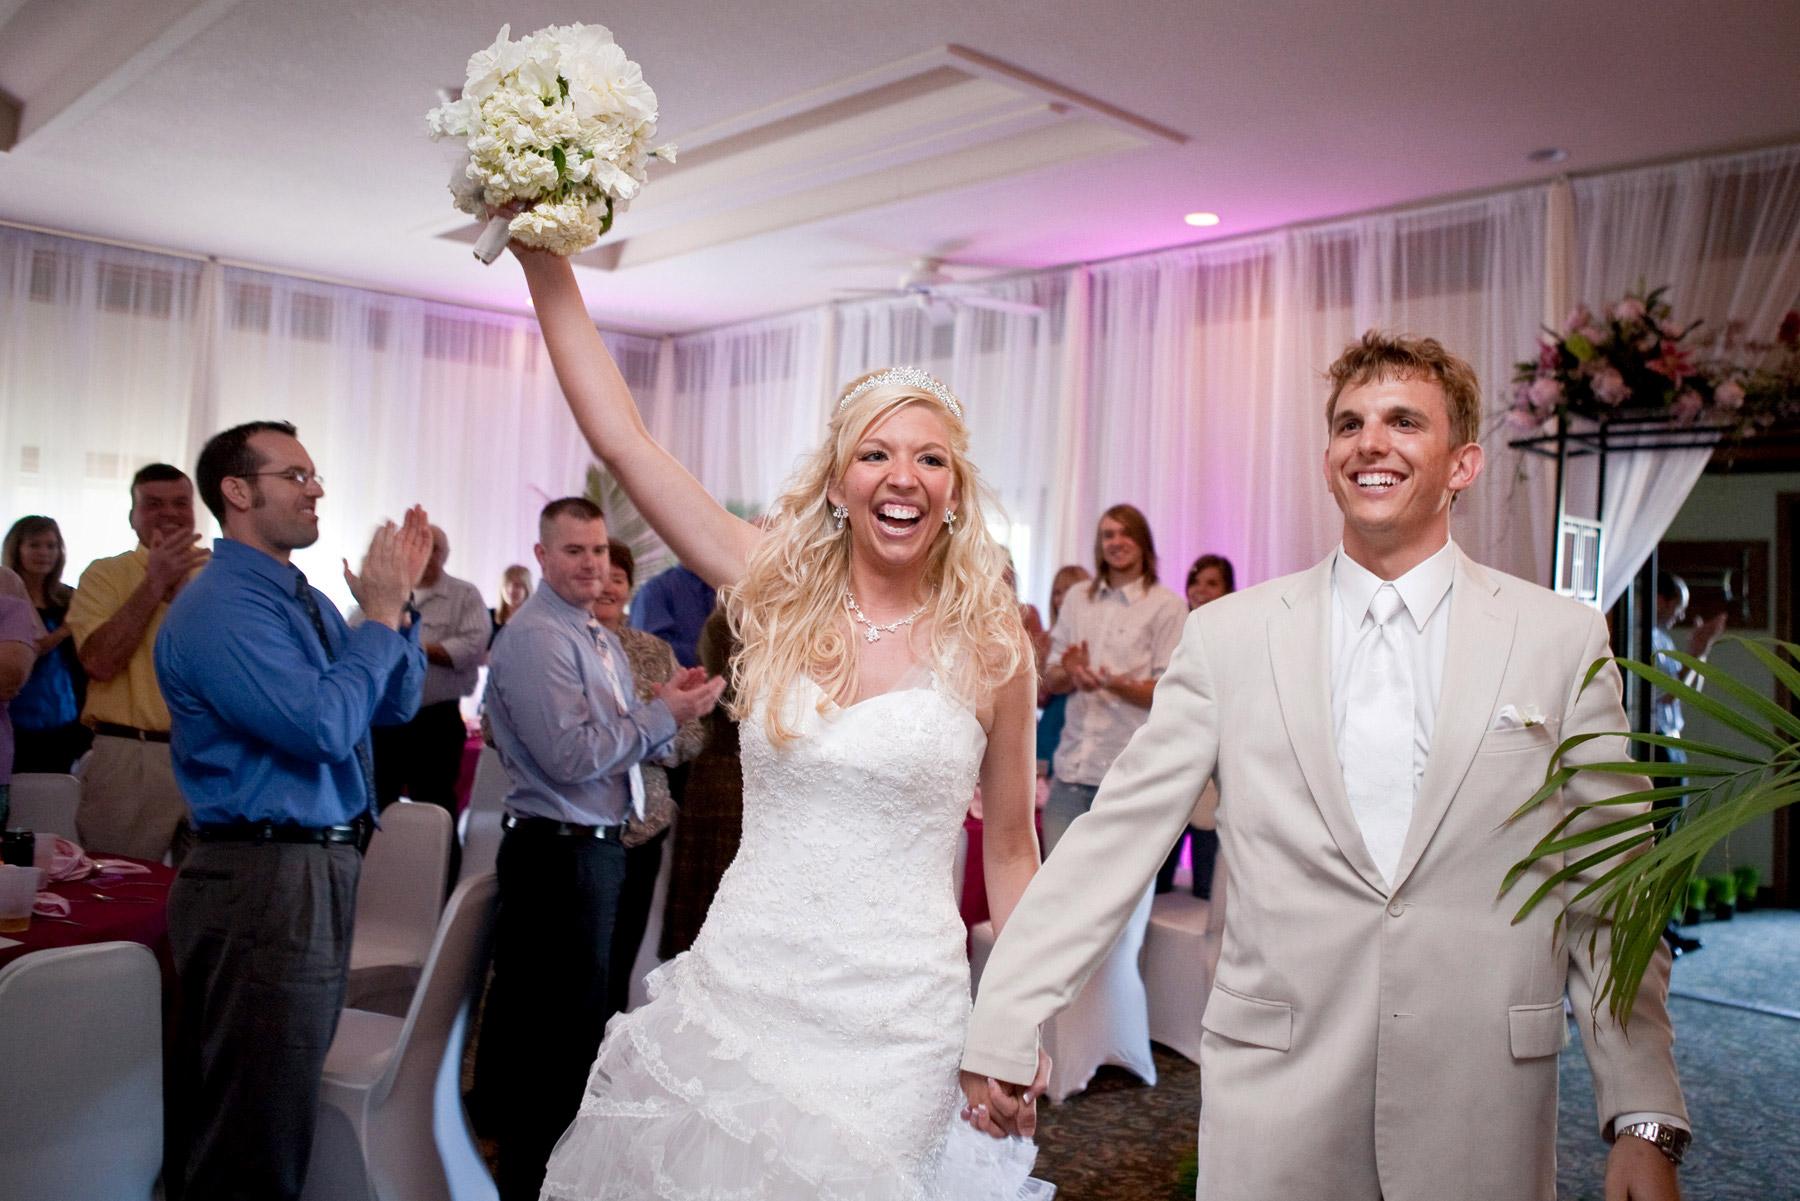 wedding-photography-saint-paul-mark-kegans-603.jpg